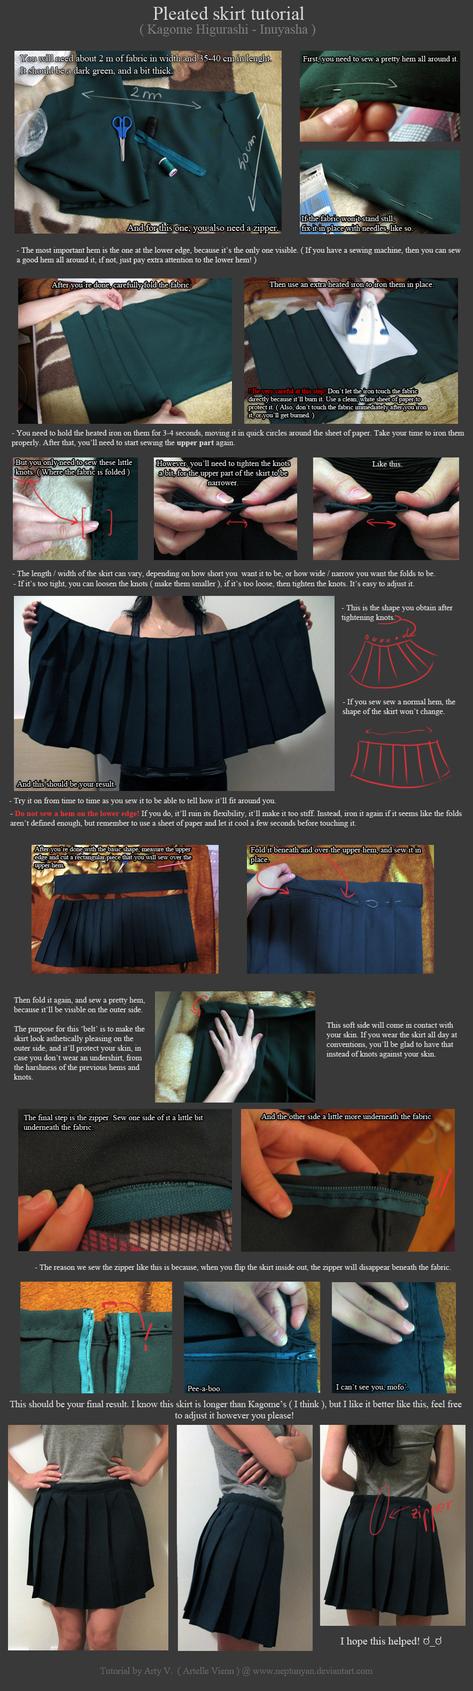 Pleated skirt tutorial - Kagome Higurashi. by neptunyan